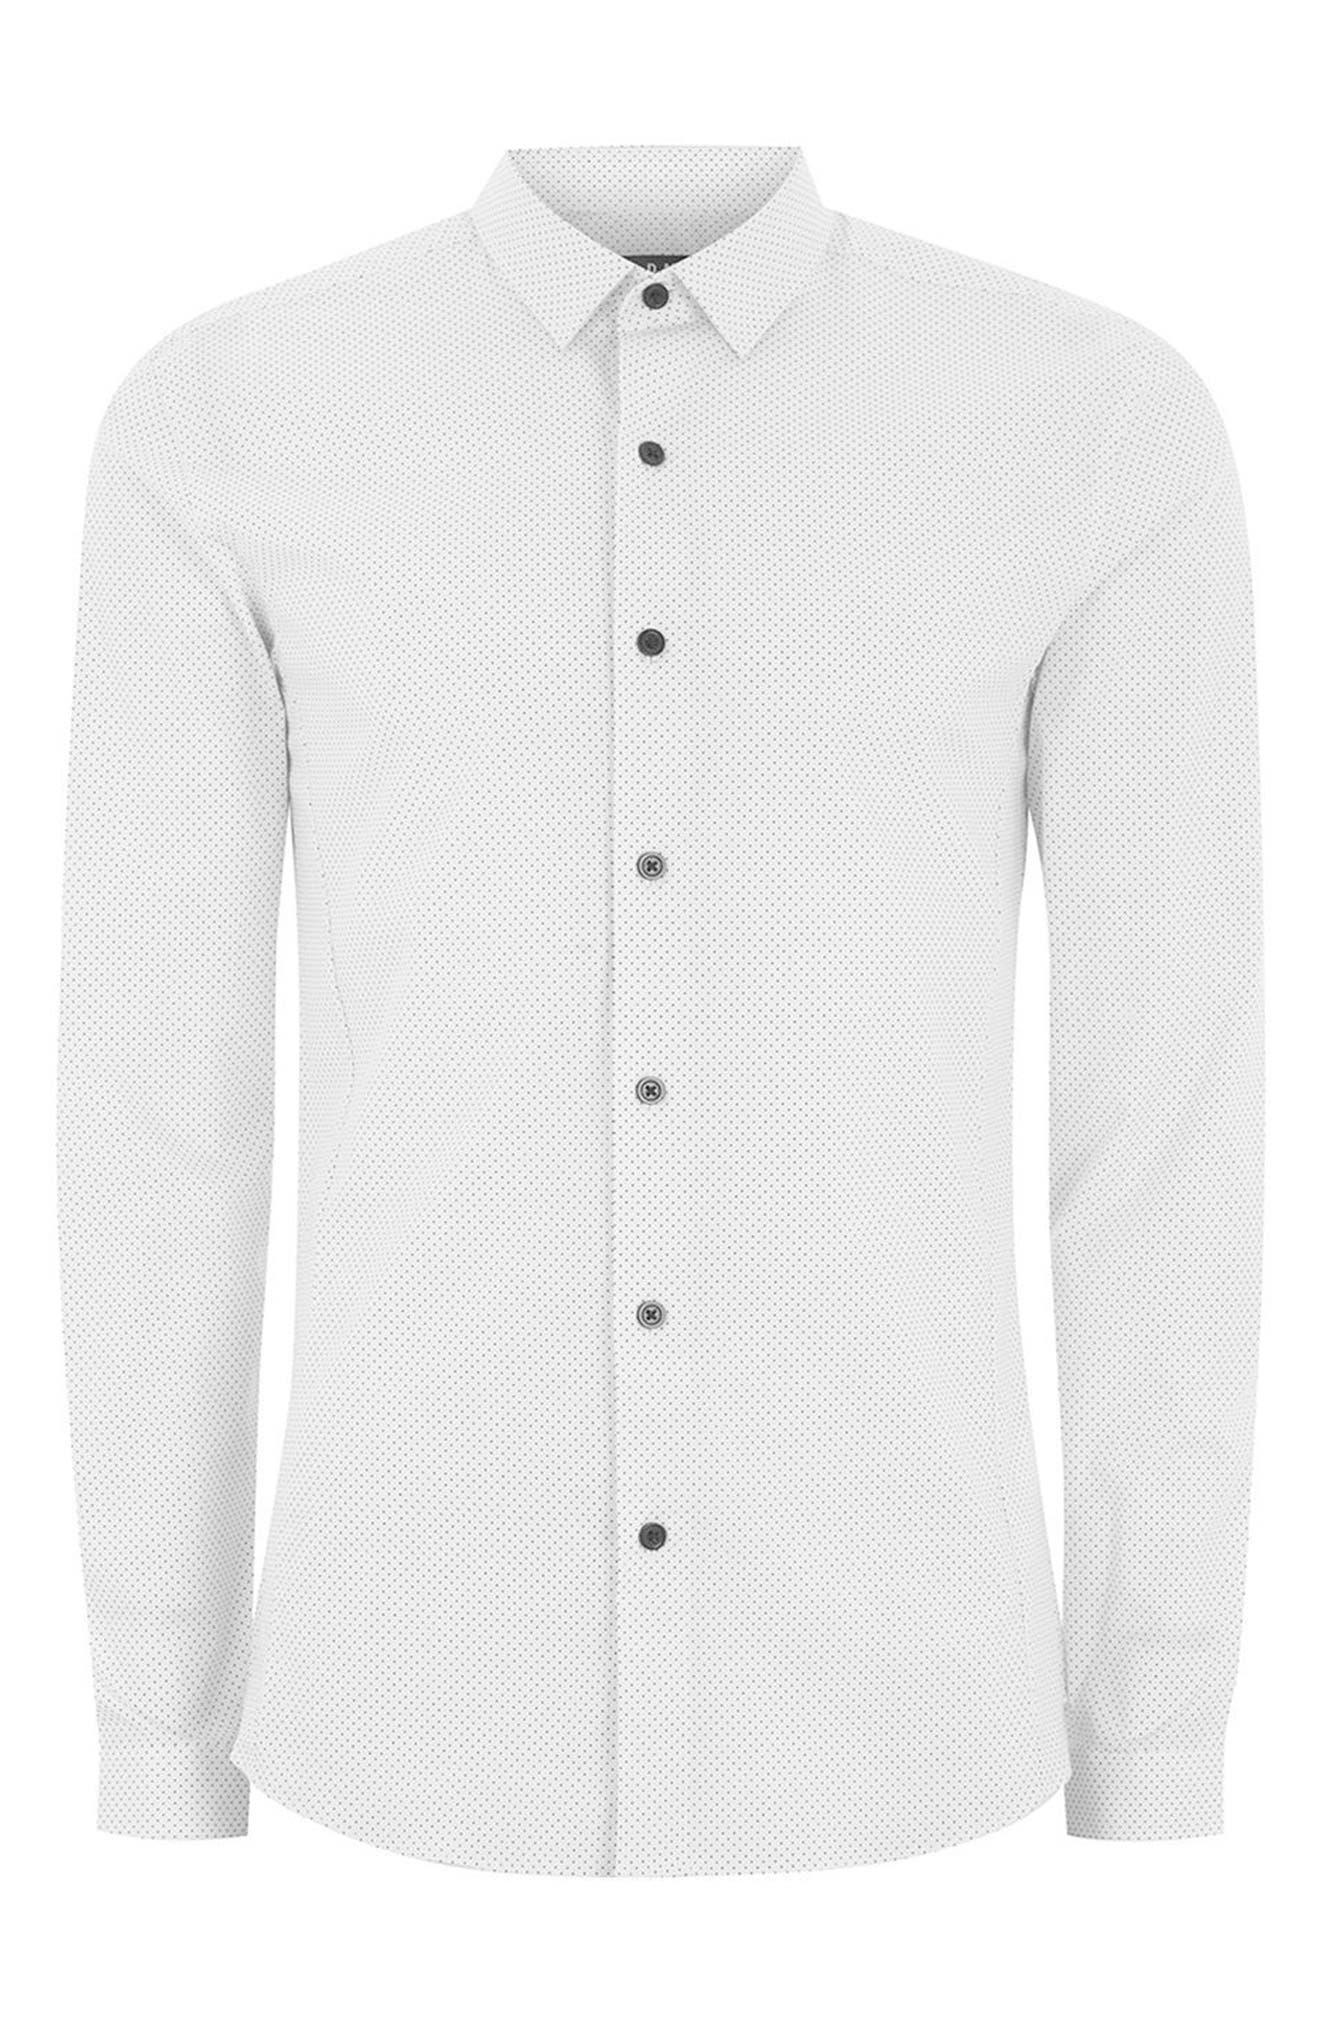 Muscle Fit Polka Dot Sport Shirt,                             Alternate thumbnail 4, color,                             White Multi